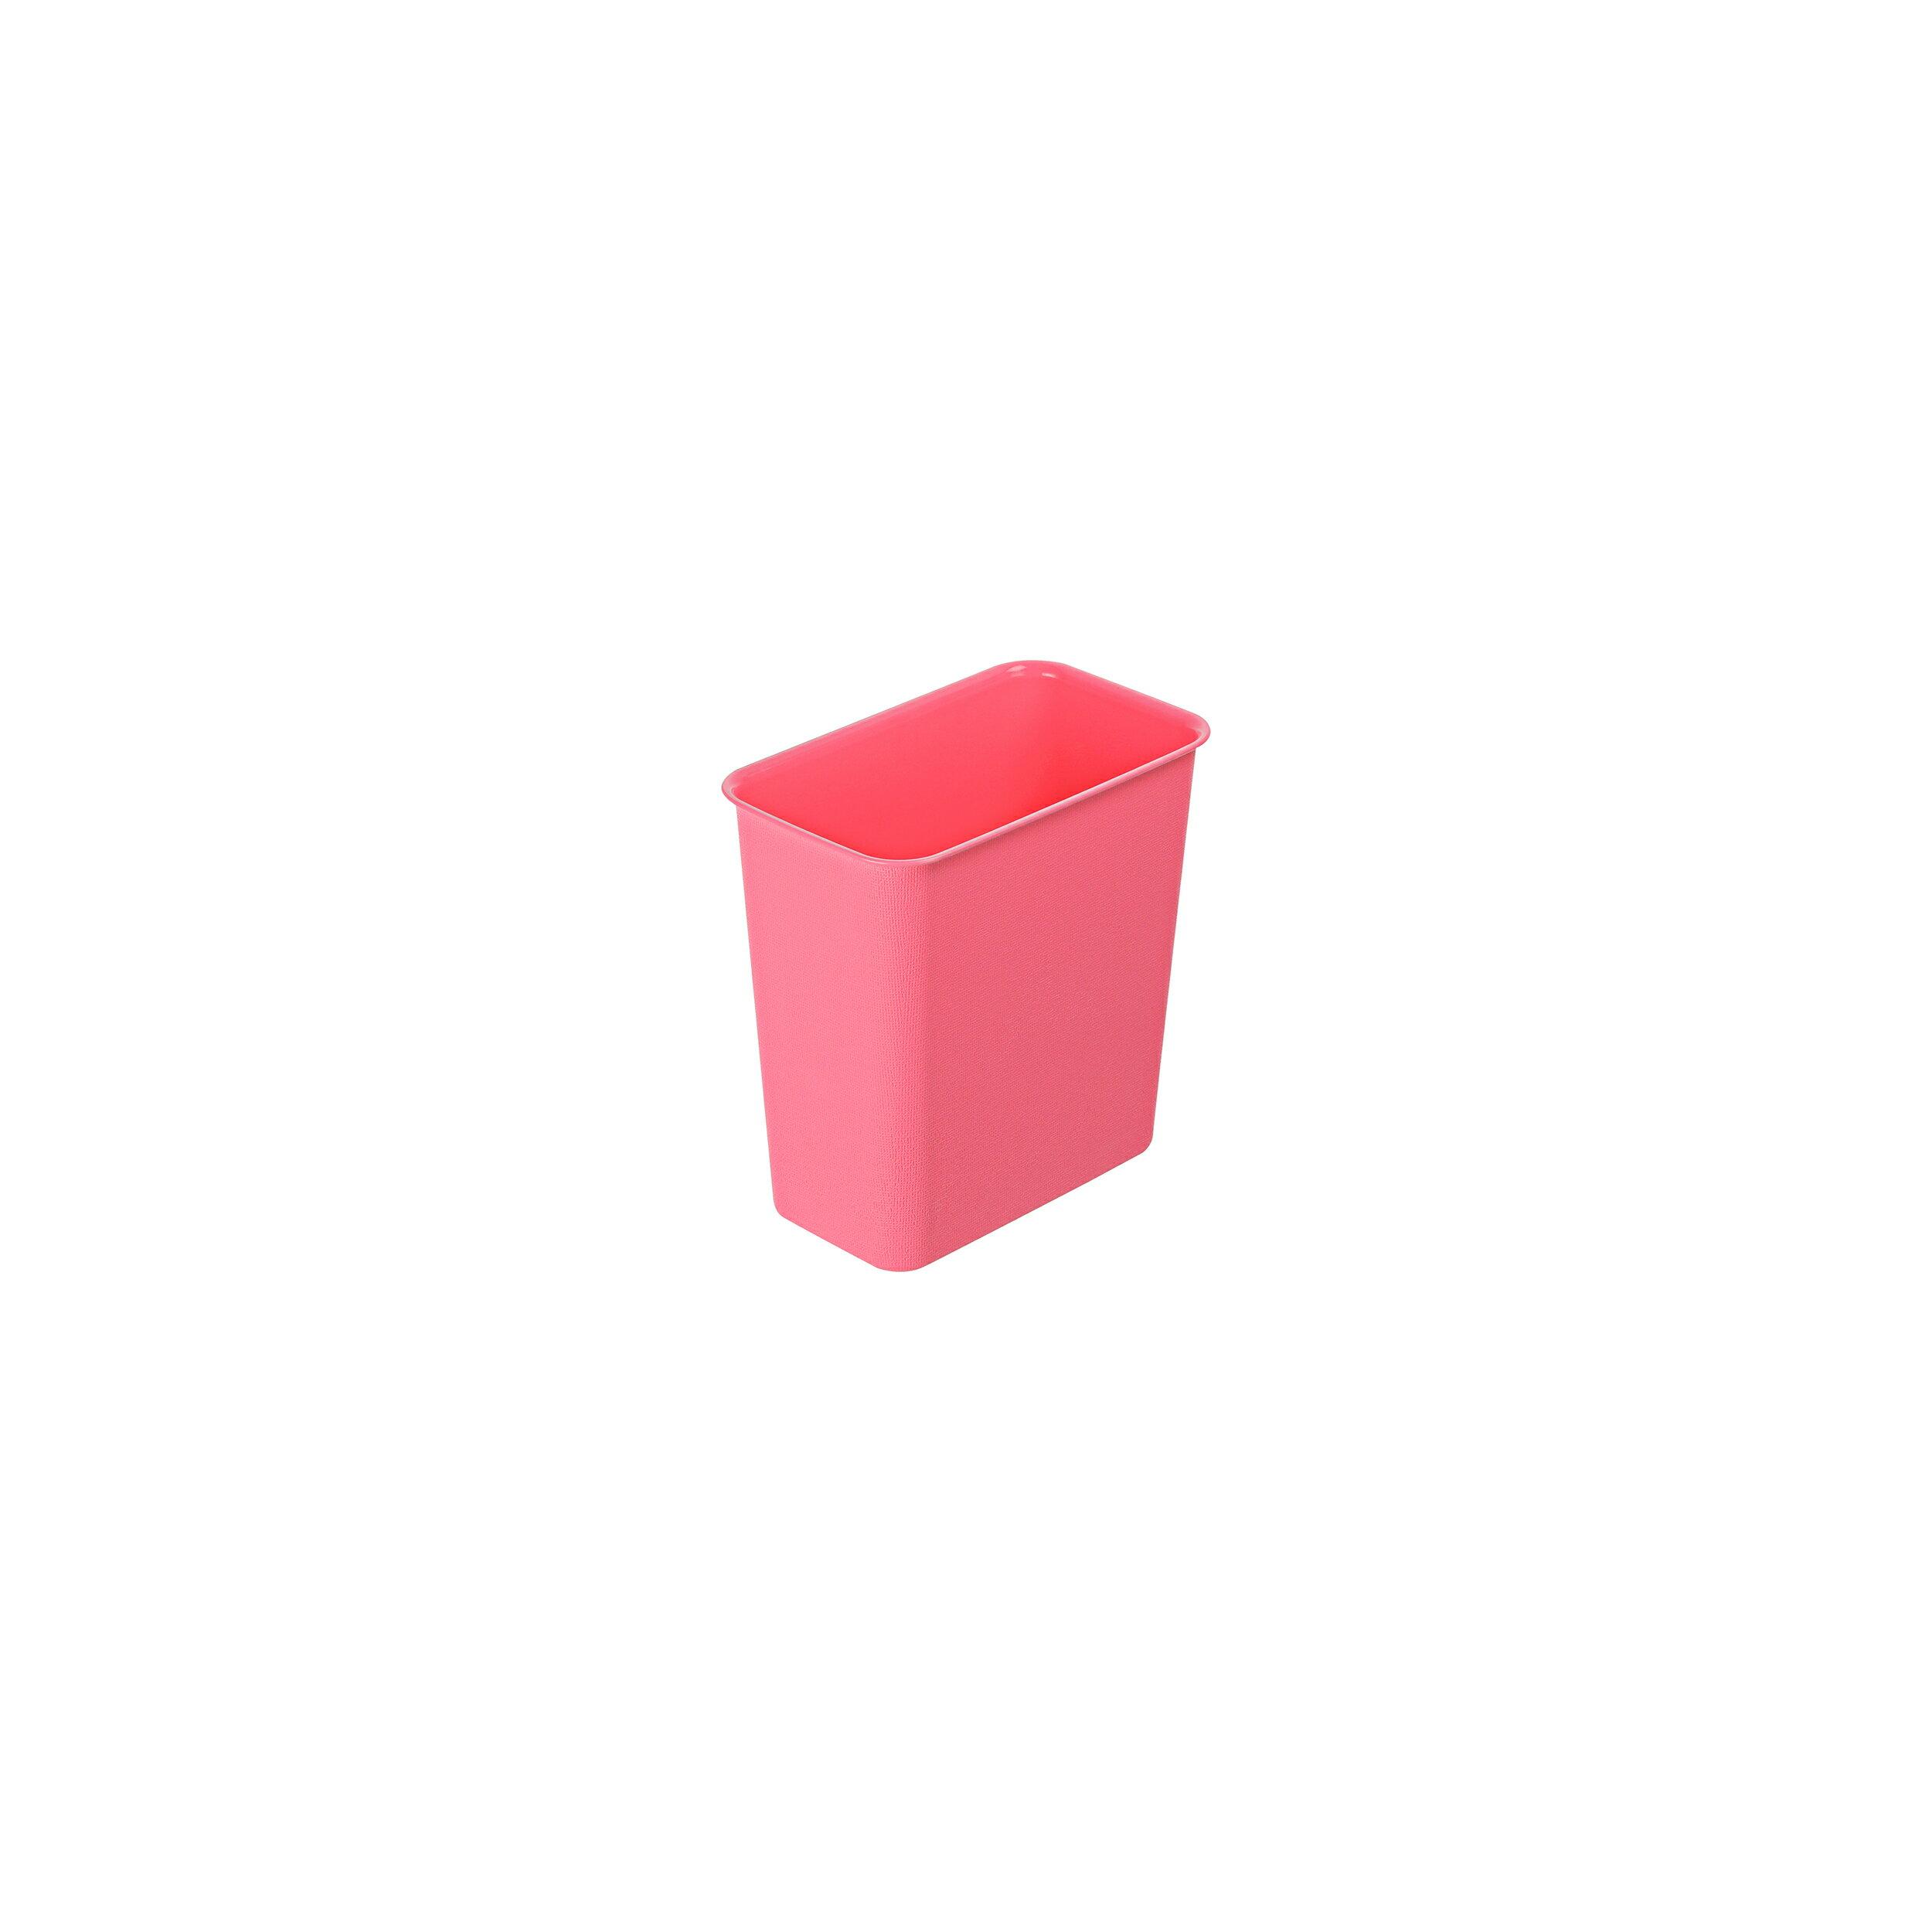 KEYWAY聯府 MIT 小彩虹垃圾桶(長型)C9303(顏色隨機出貨) 2